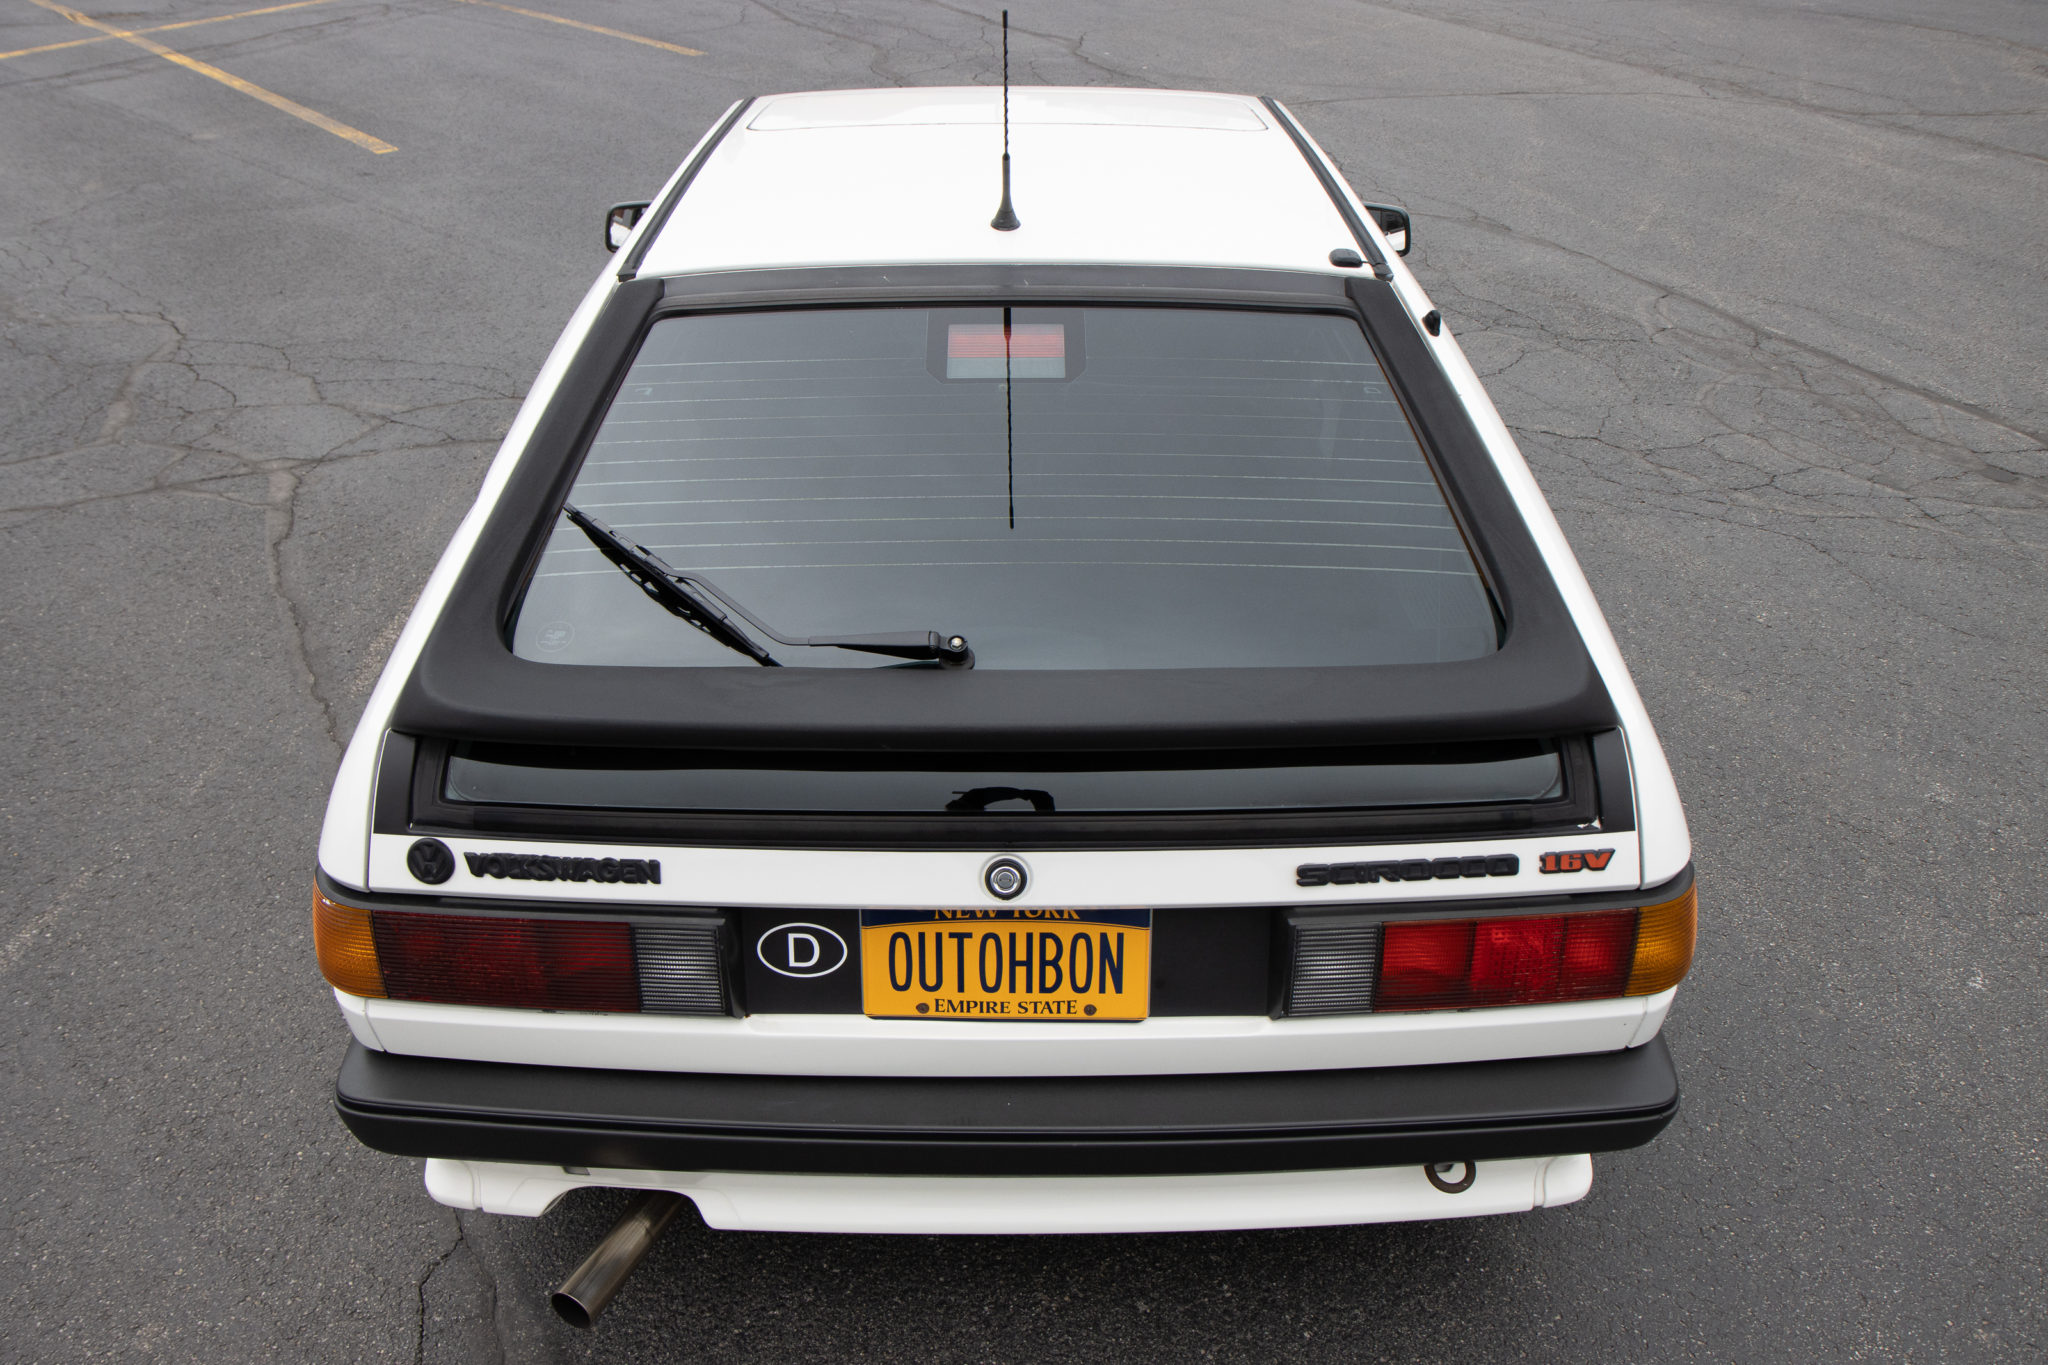 1988_volkswagen_scirocco_16v_1589486349a8412ddCopy-of-VW-Scirocco-BaT-0010-scaled